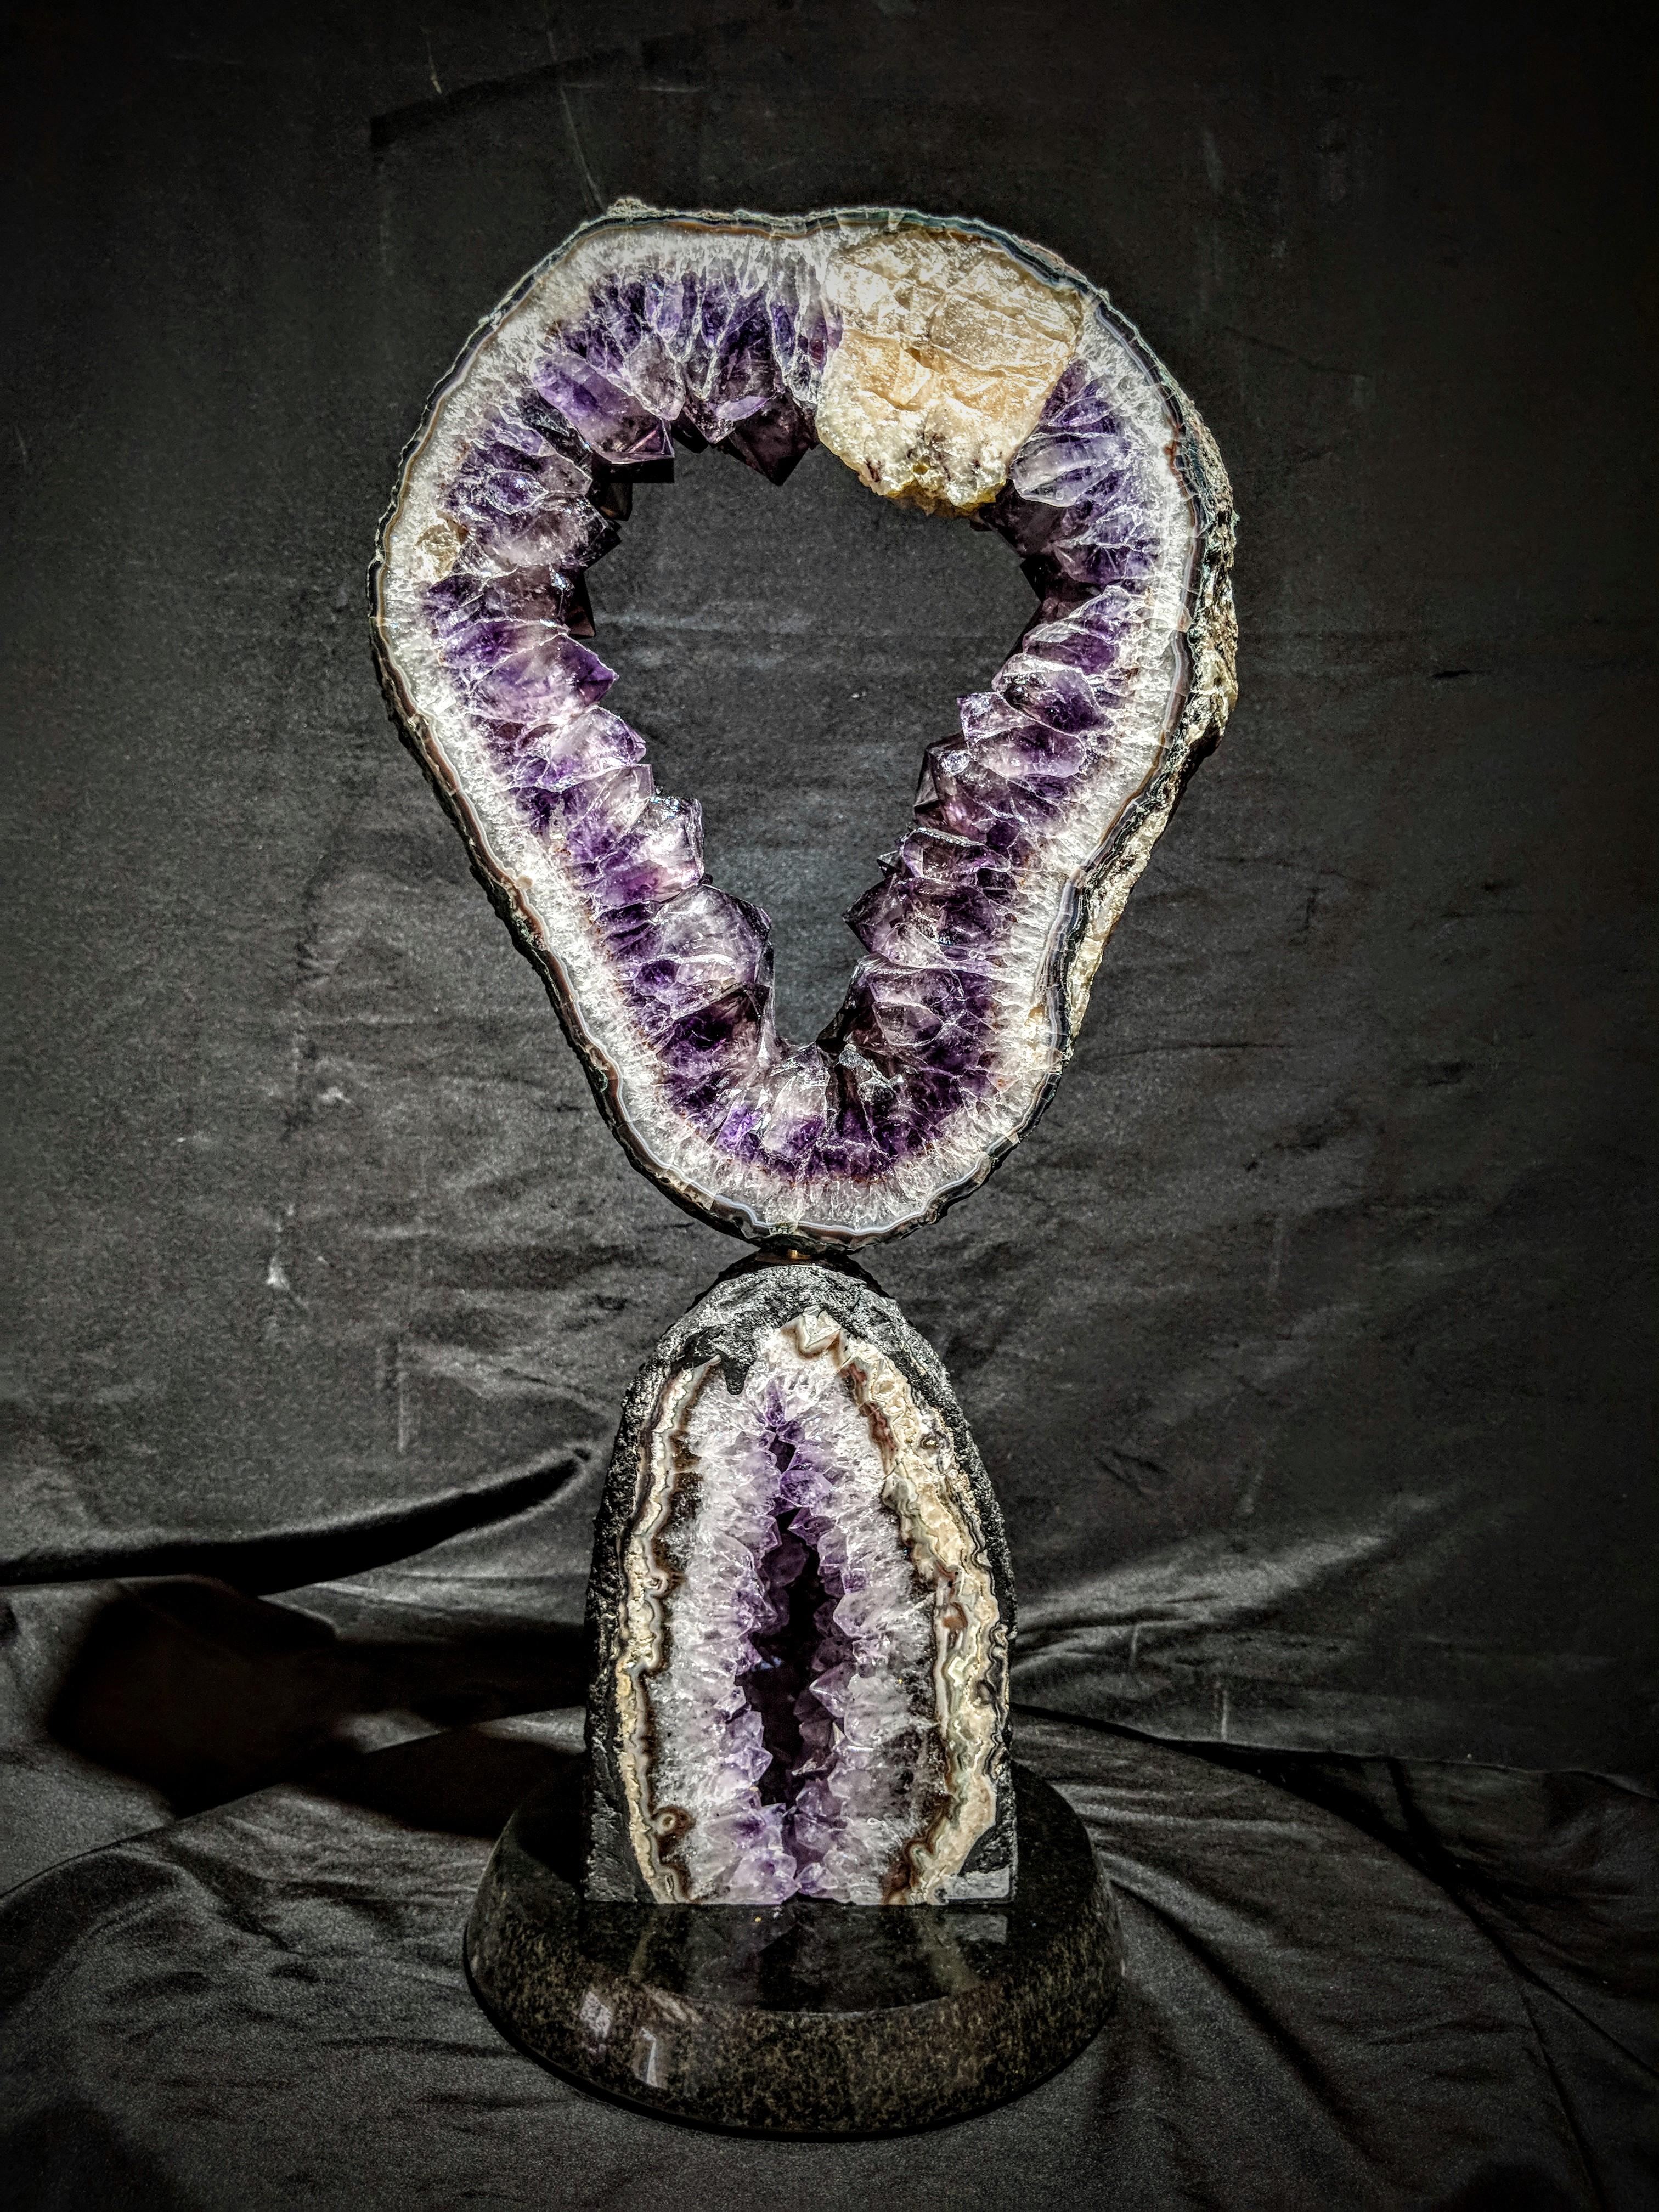 Amethyst Geode Sculpture